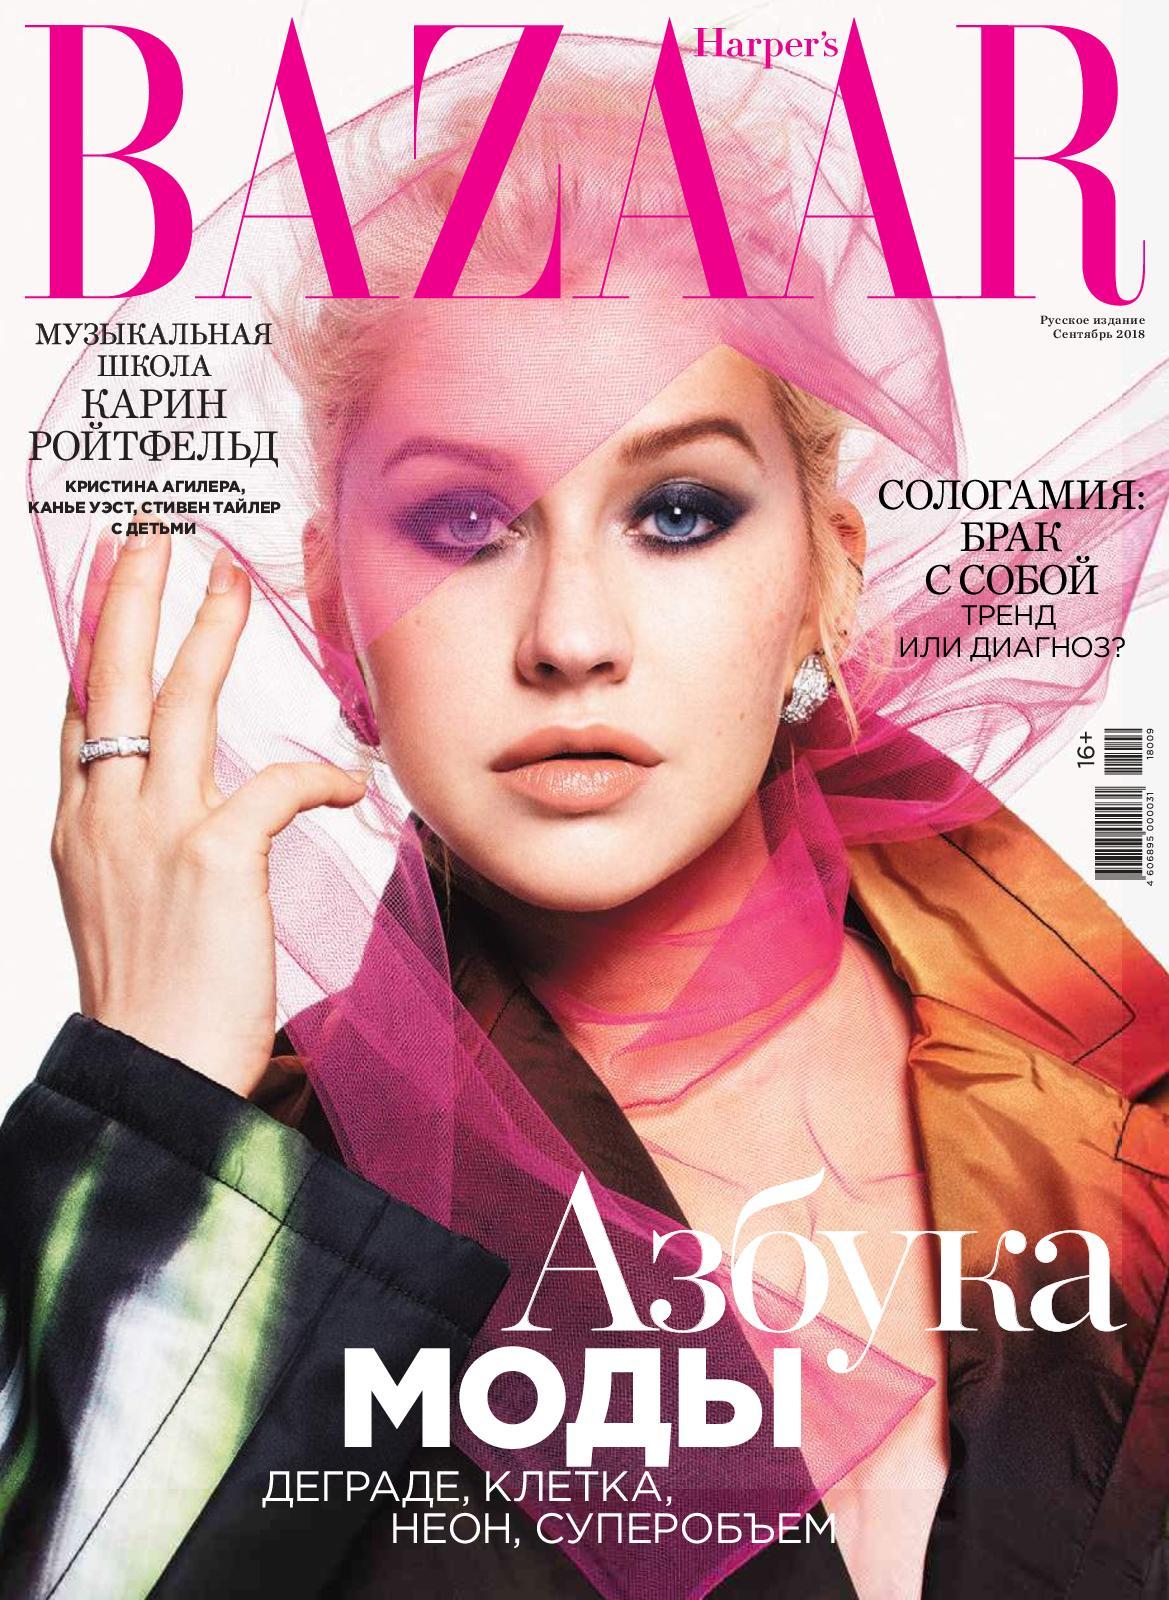 Calaméo - Harper s Bazaar №31 2018 cd78ae15927